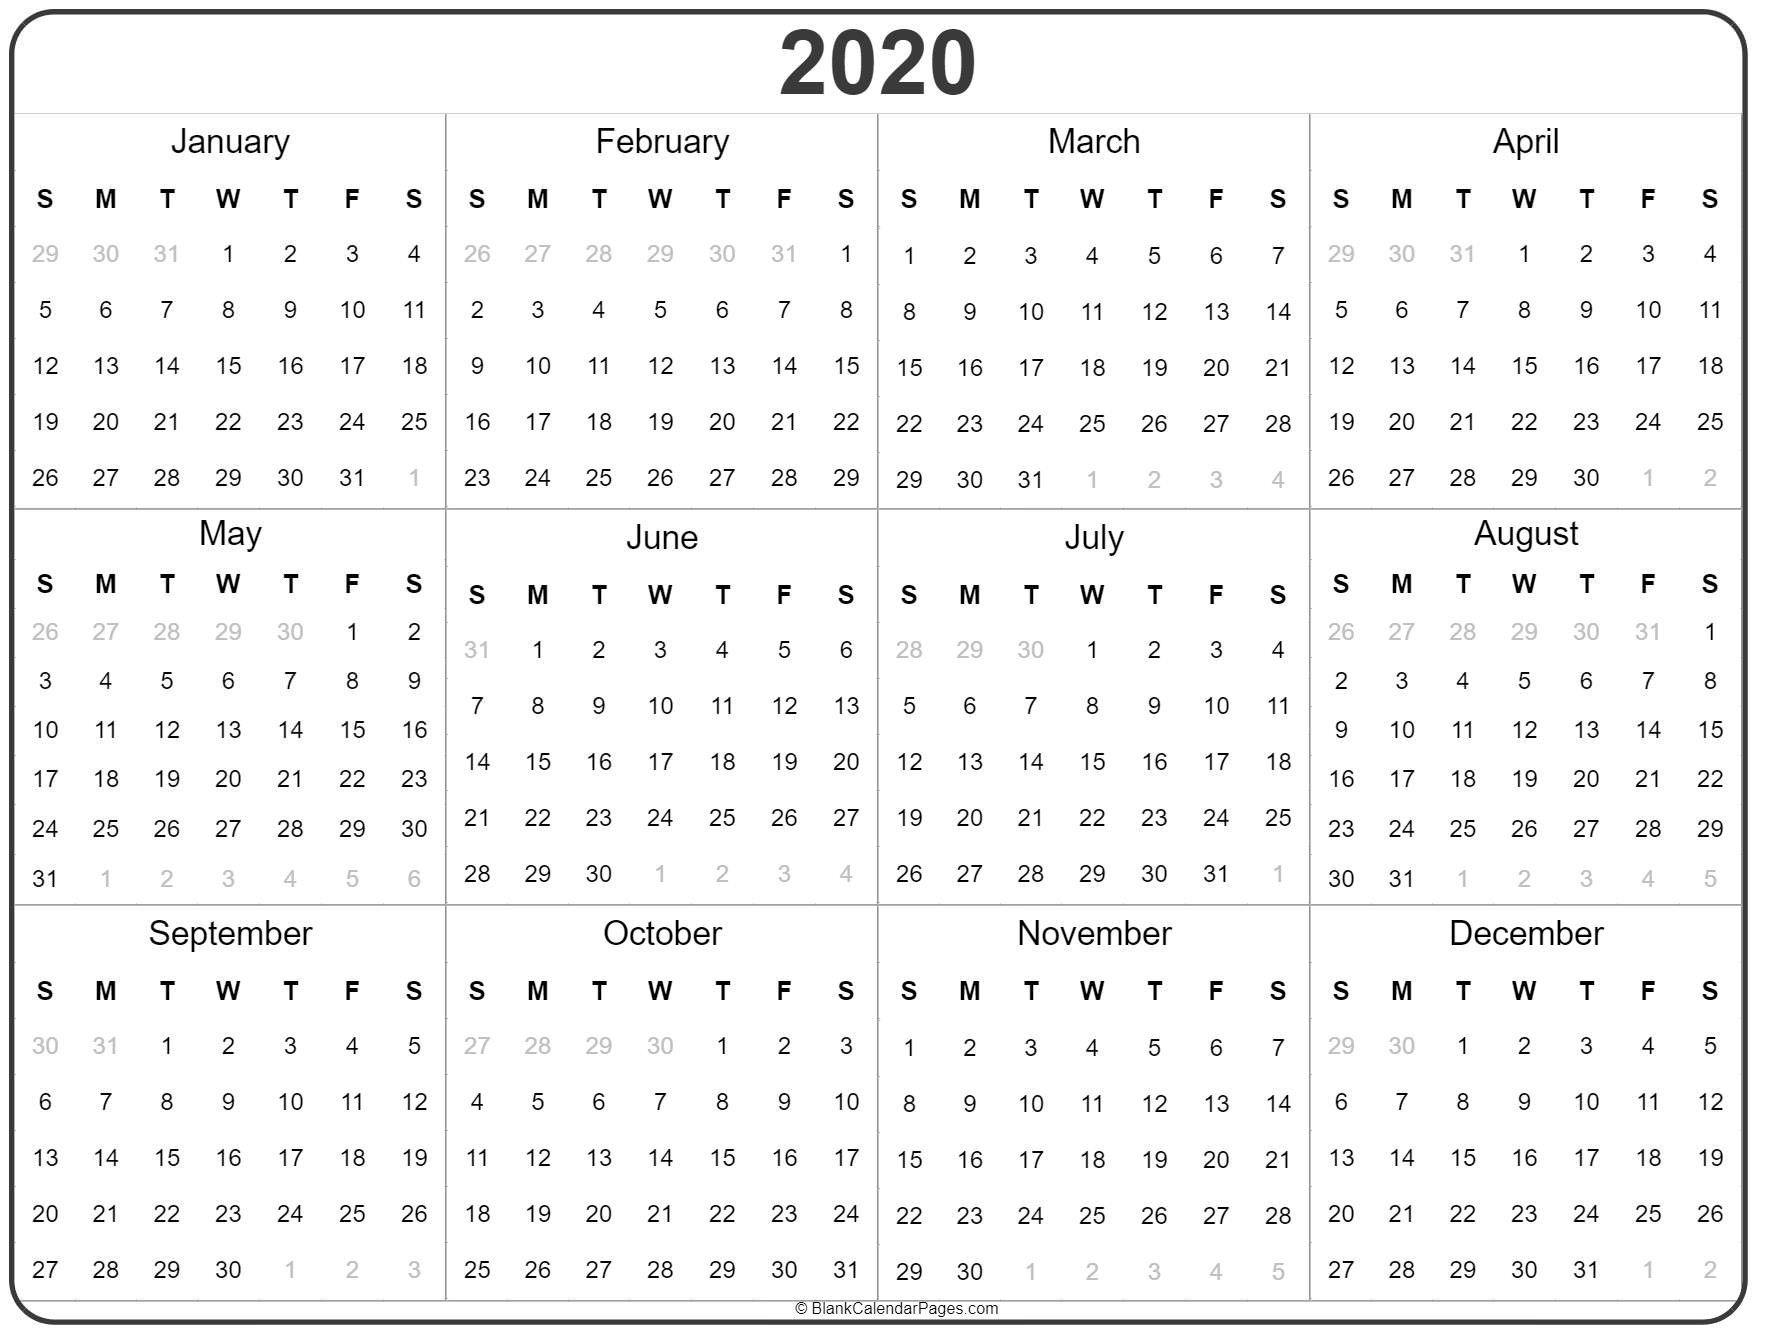 2020 Year Calendar Yearly Printable 2020 Year Calendar Yearly